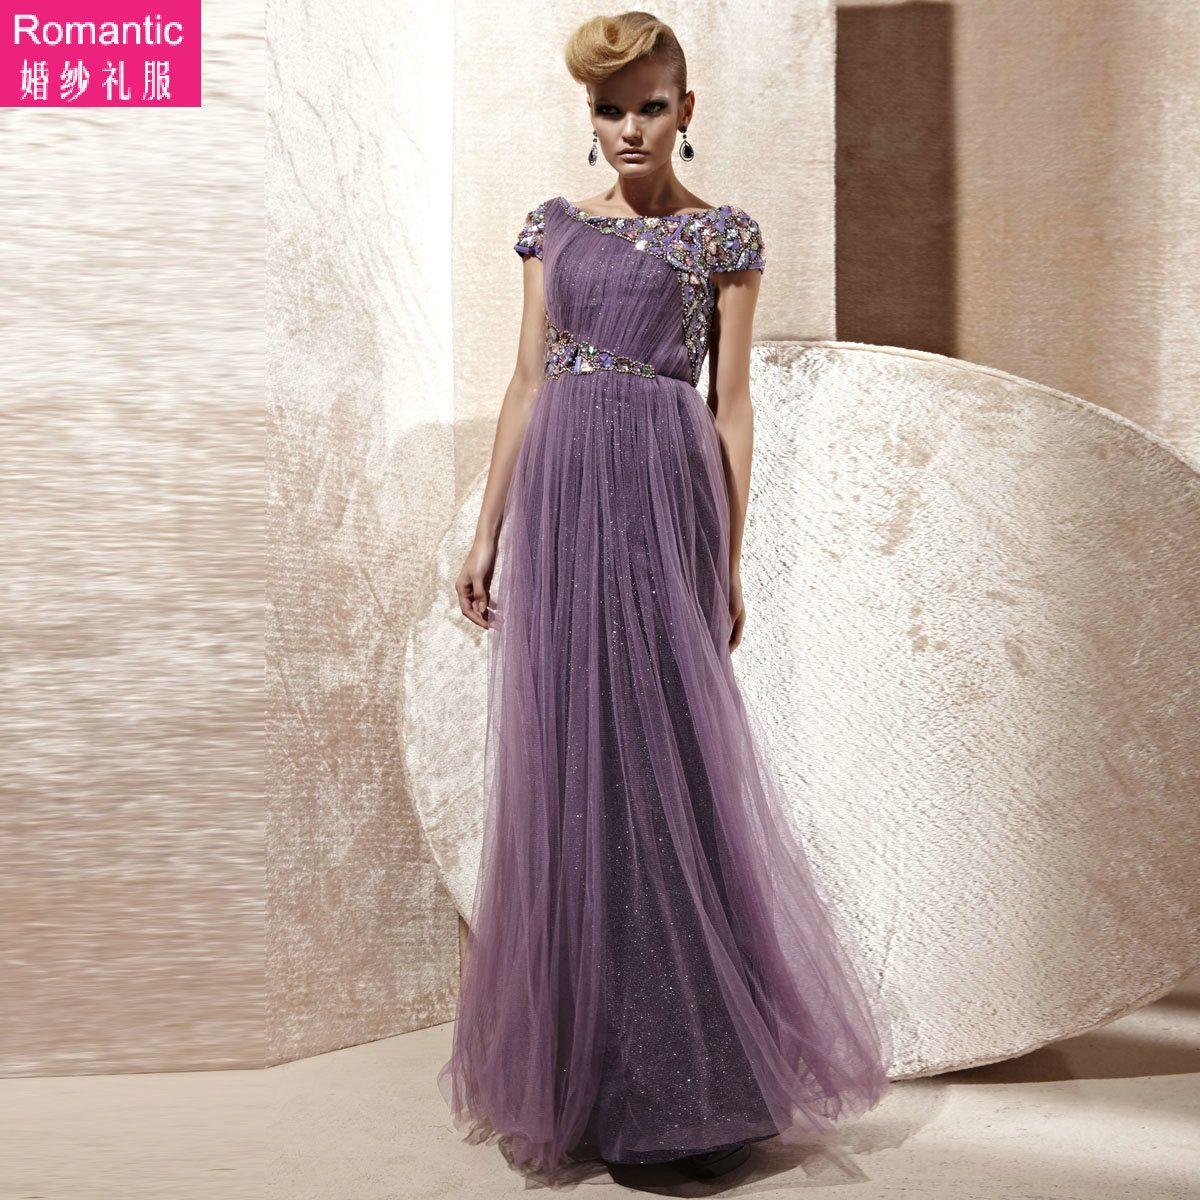 TOP QUALITY purple wedding dress bride long chiffon dress hollywood ...